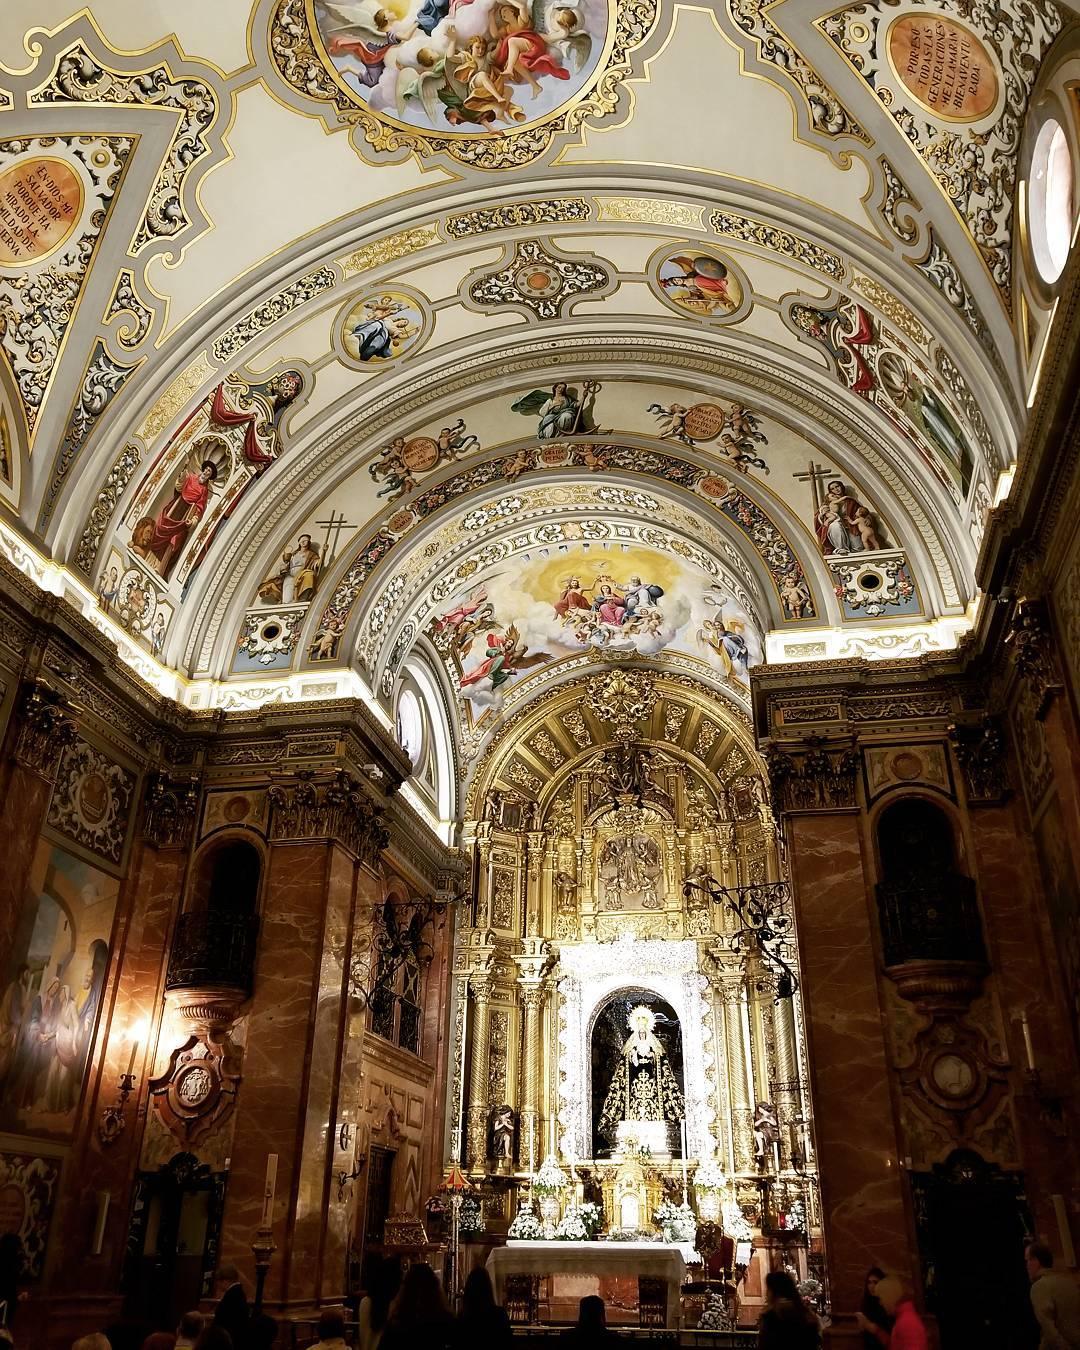 Inside la Basílica de la Macarena